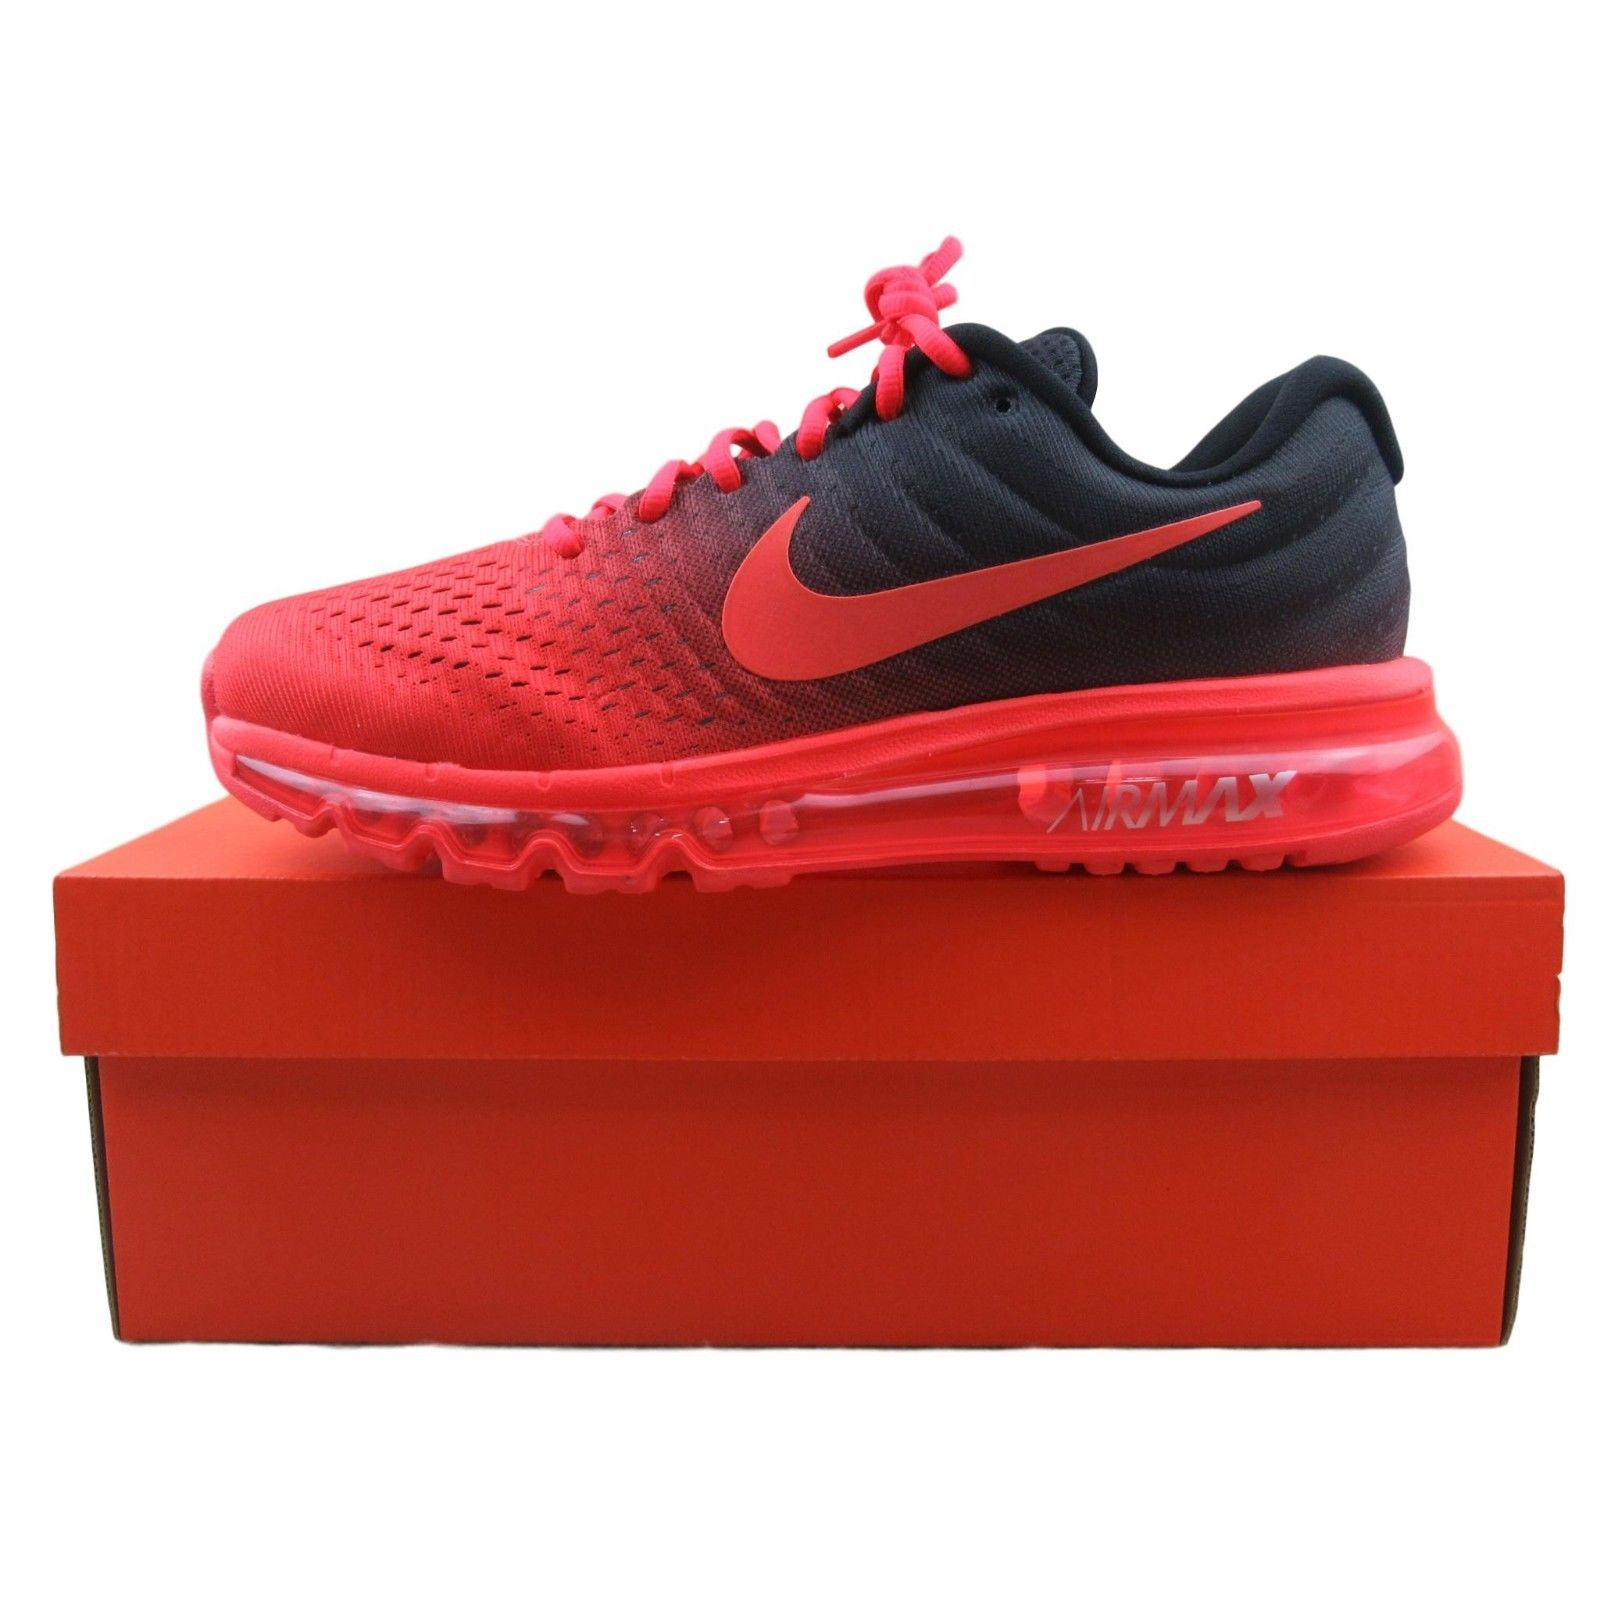 5769b59410 Nike Air Max Running Shoes Size 9.5 Mens Black Crimson 849559 600 ...